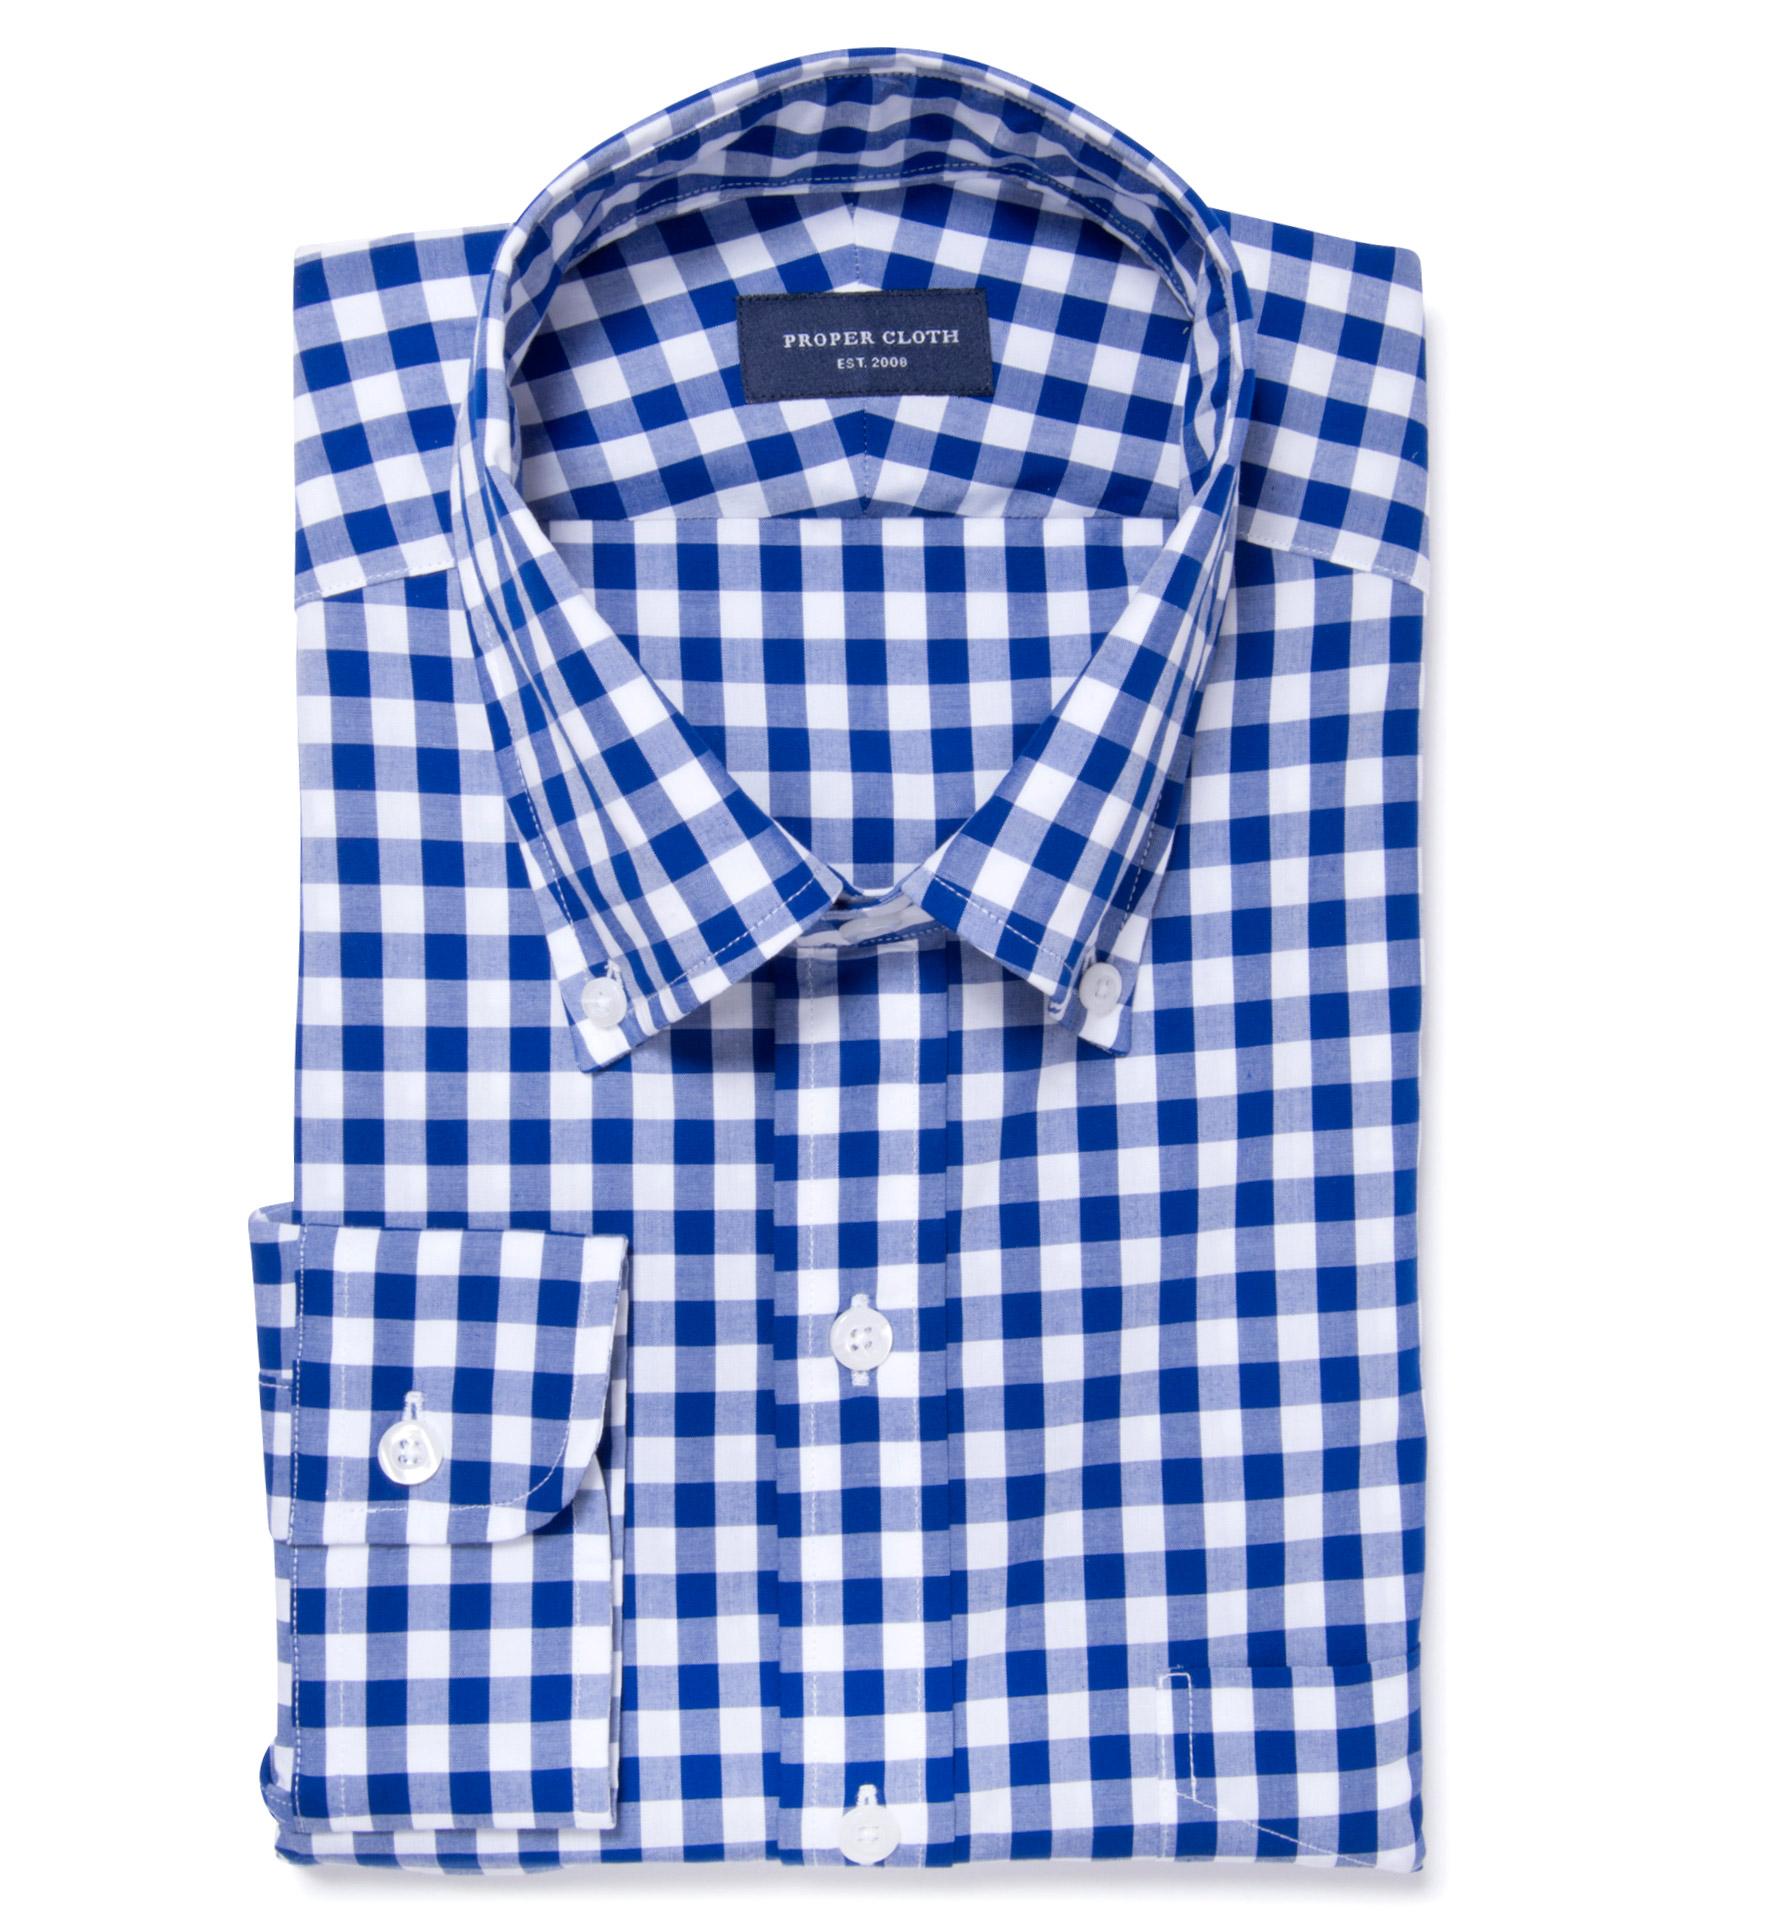 Blue Mens Shirts  Blue Shirts for Men  Next Official Site